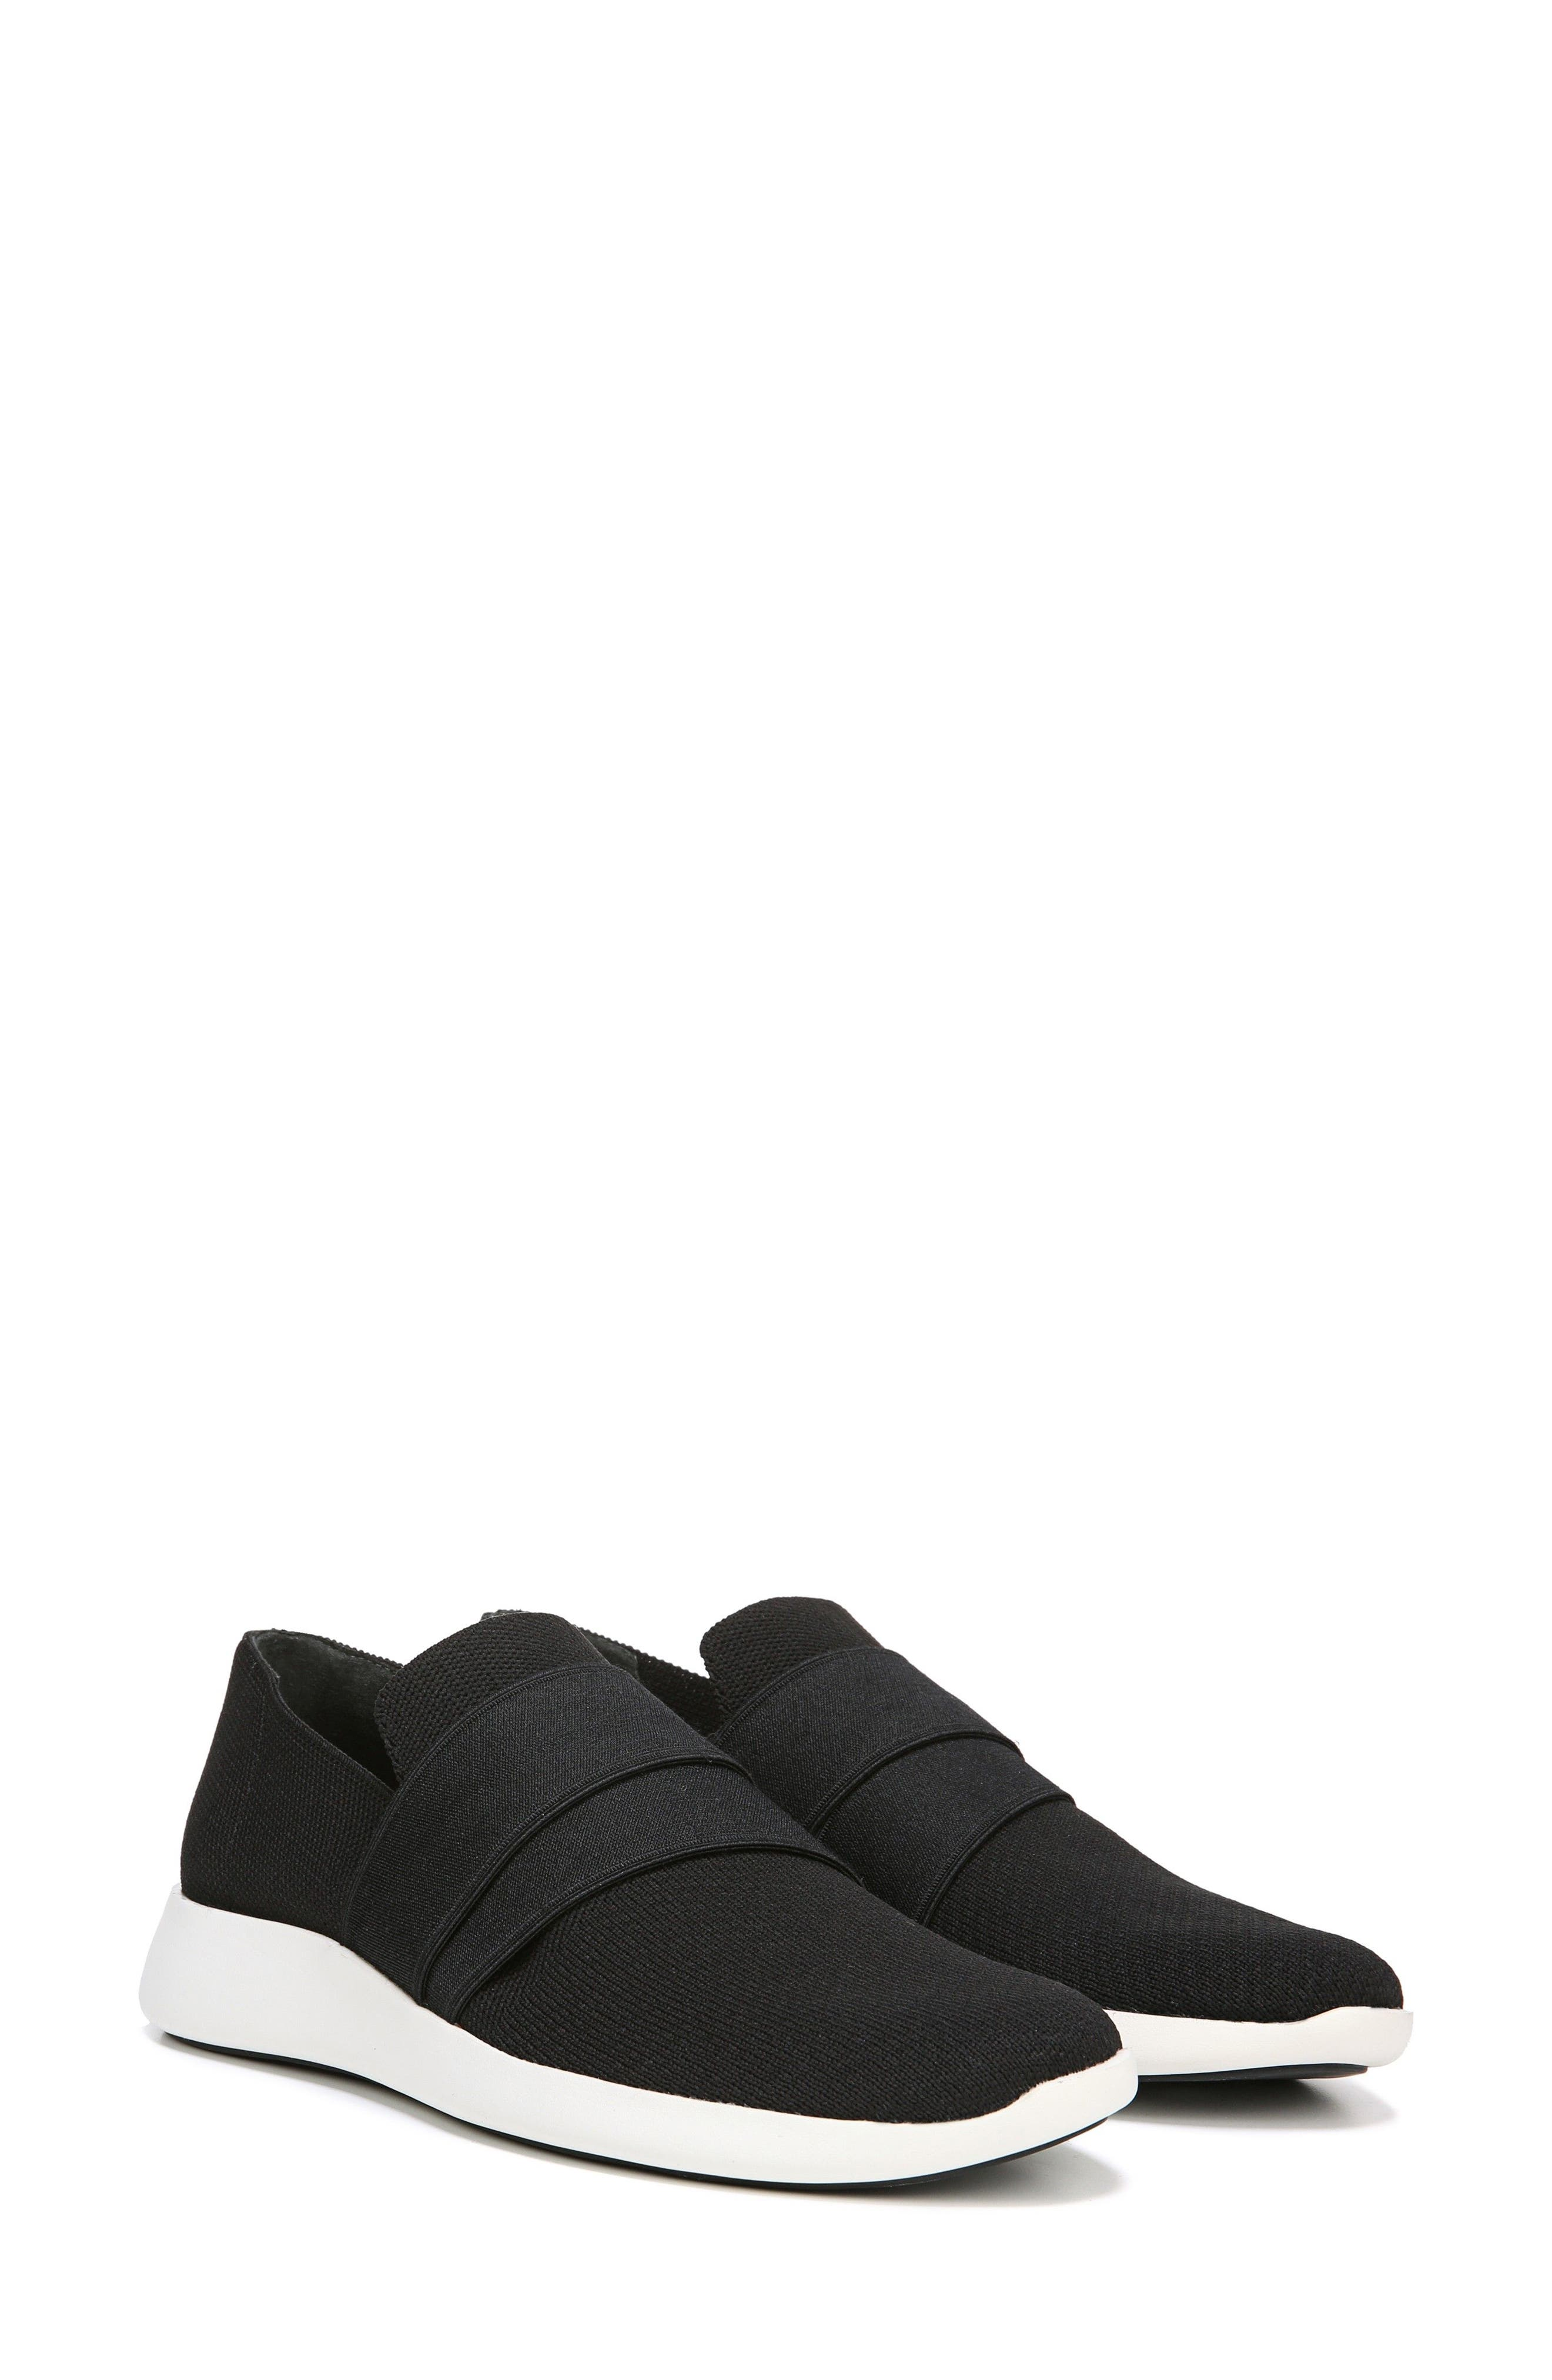 VINCE, Aston Slip-On Sneaker, Alternate thumbnail 7, color, BLACK SOLID KNIT